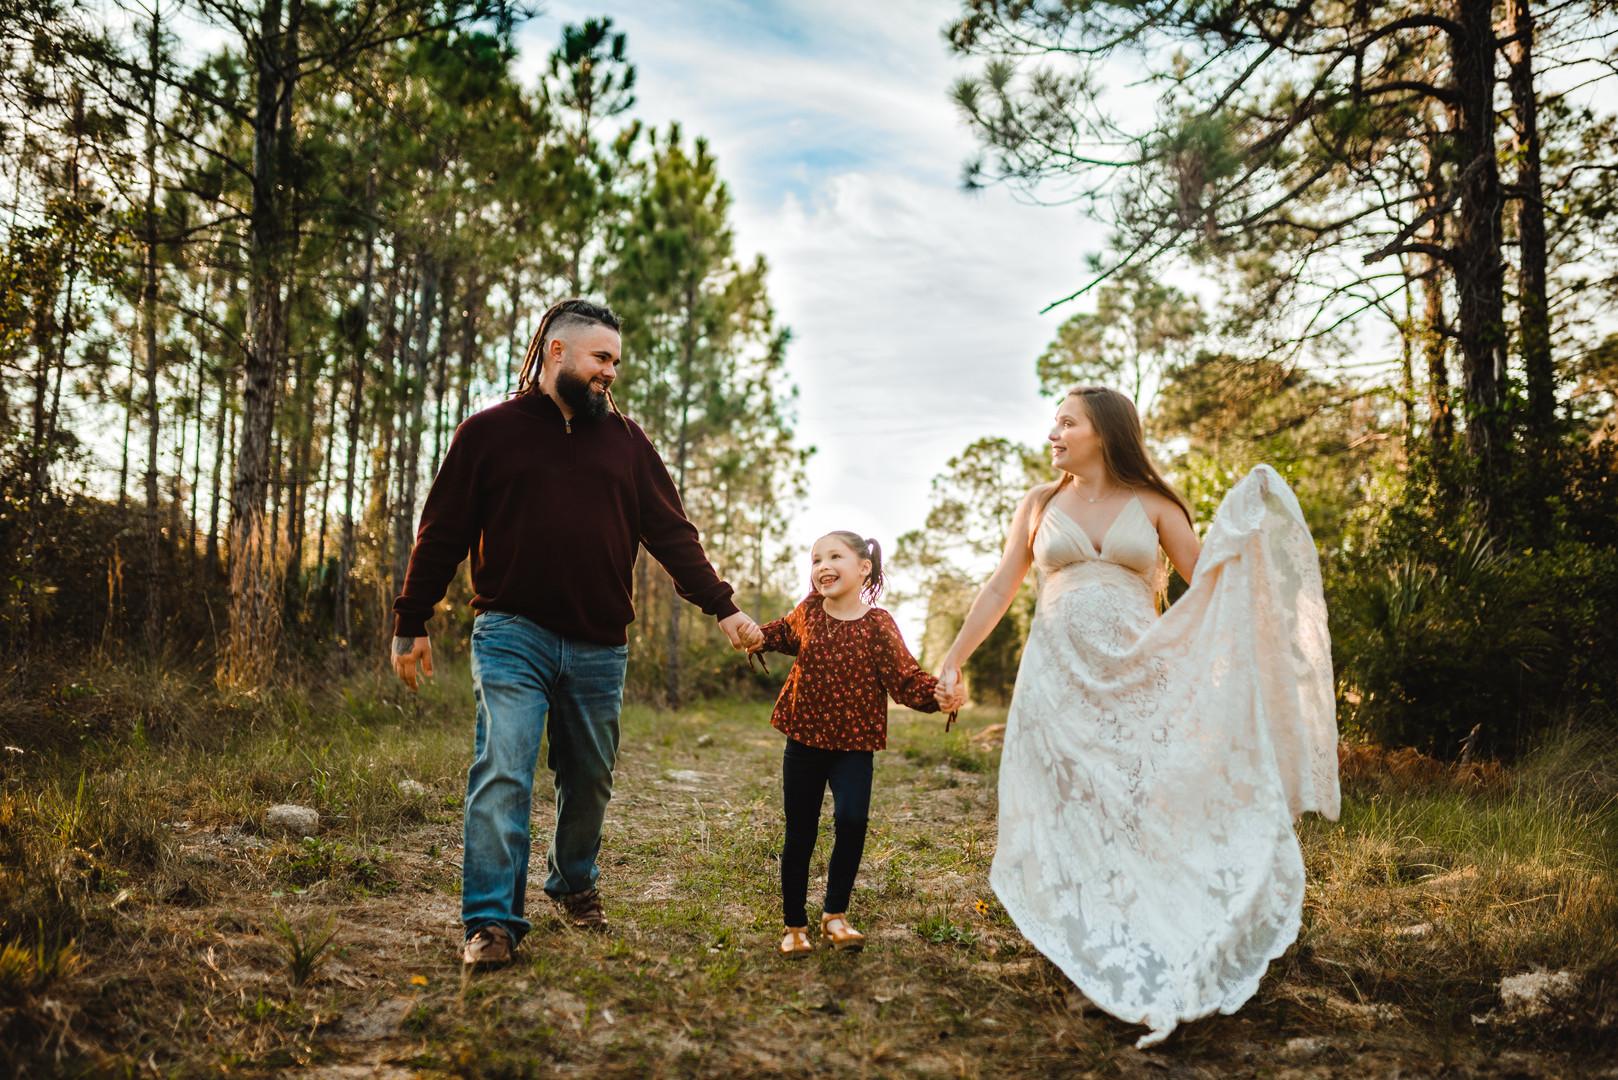 Tampa Maternity Photographer Mariah Thom